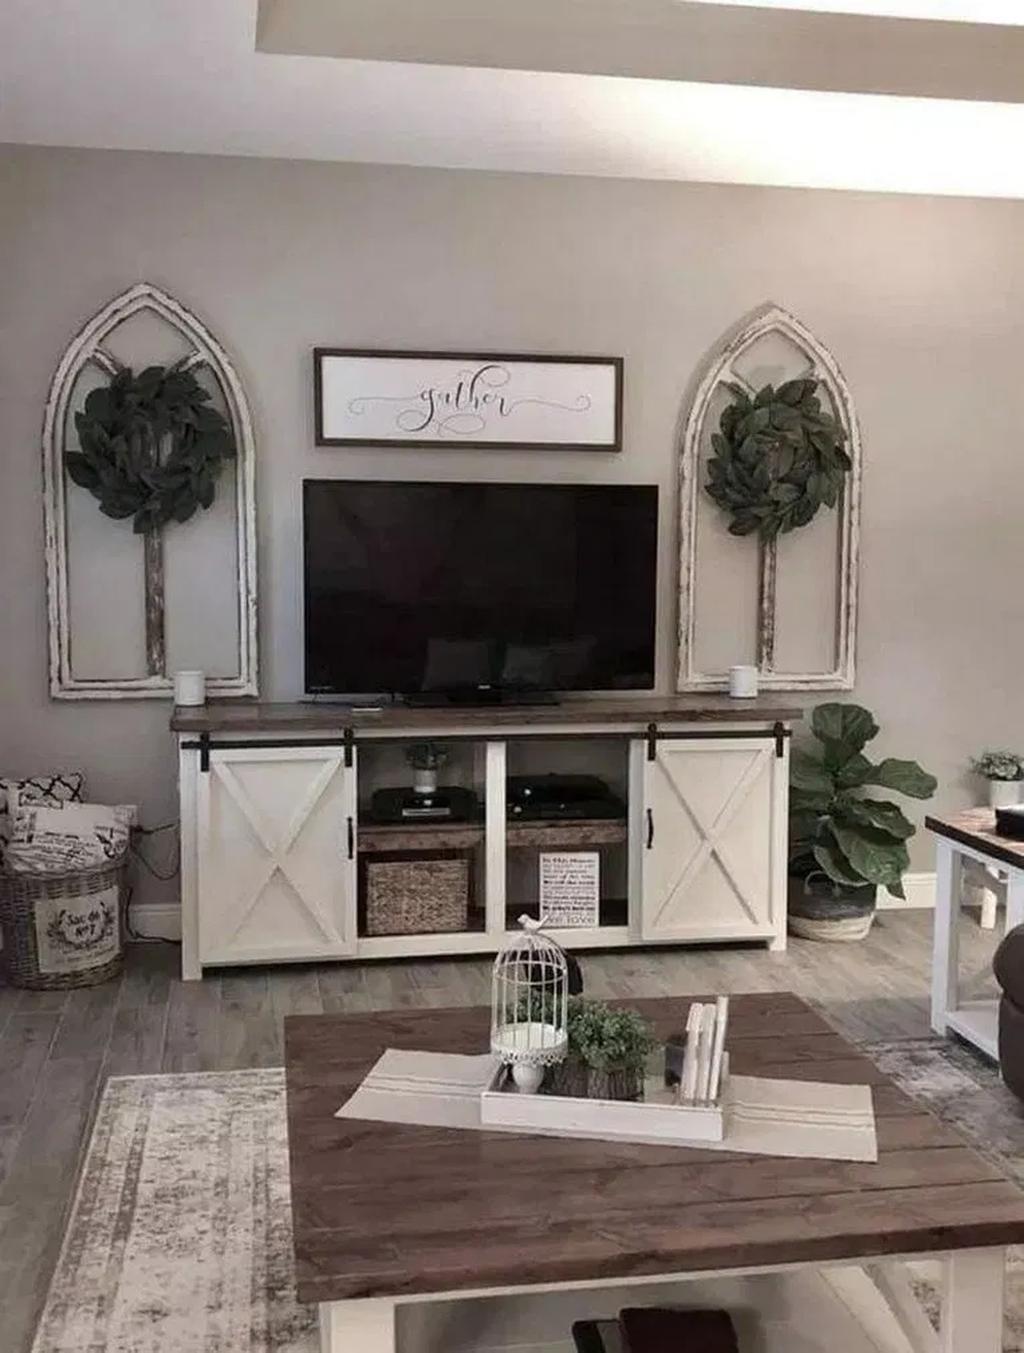 35 Popular Modern Farmhouse Living Room Decor Ideas In 2020 Modern Farmhouse Living Room Decor Farmhouse Decor Living Room Living Room Tv Stand